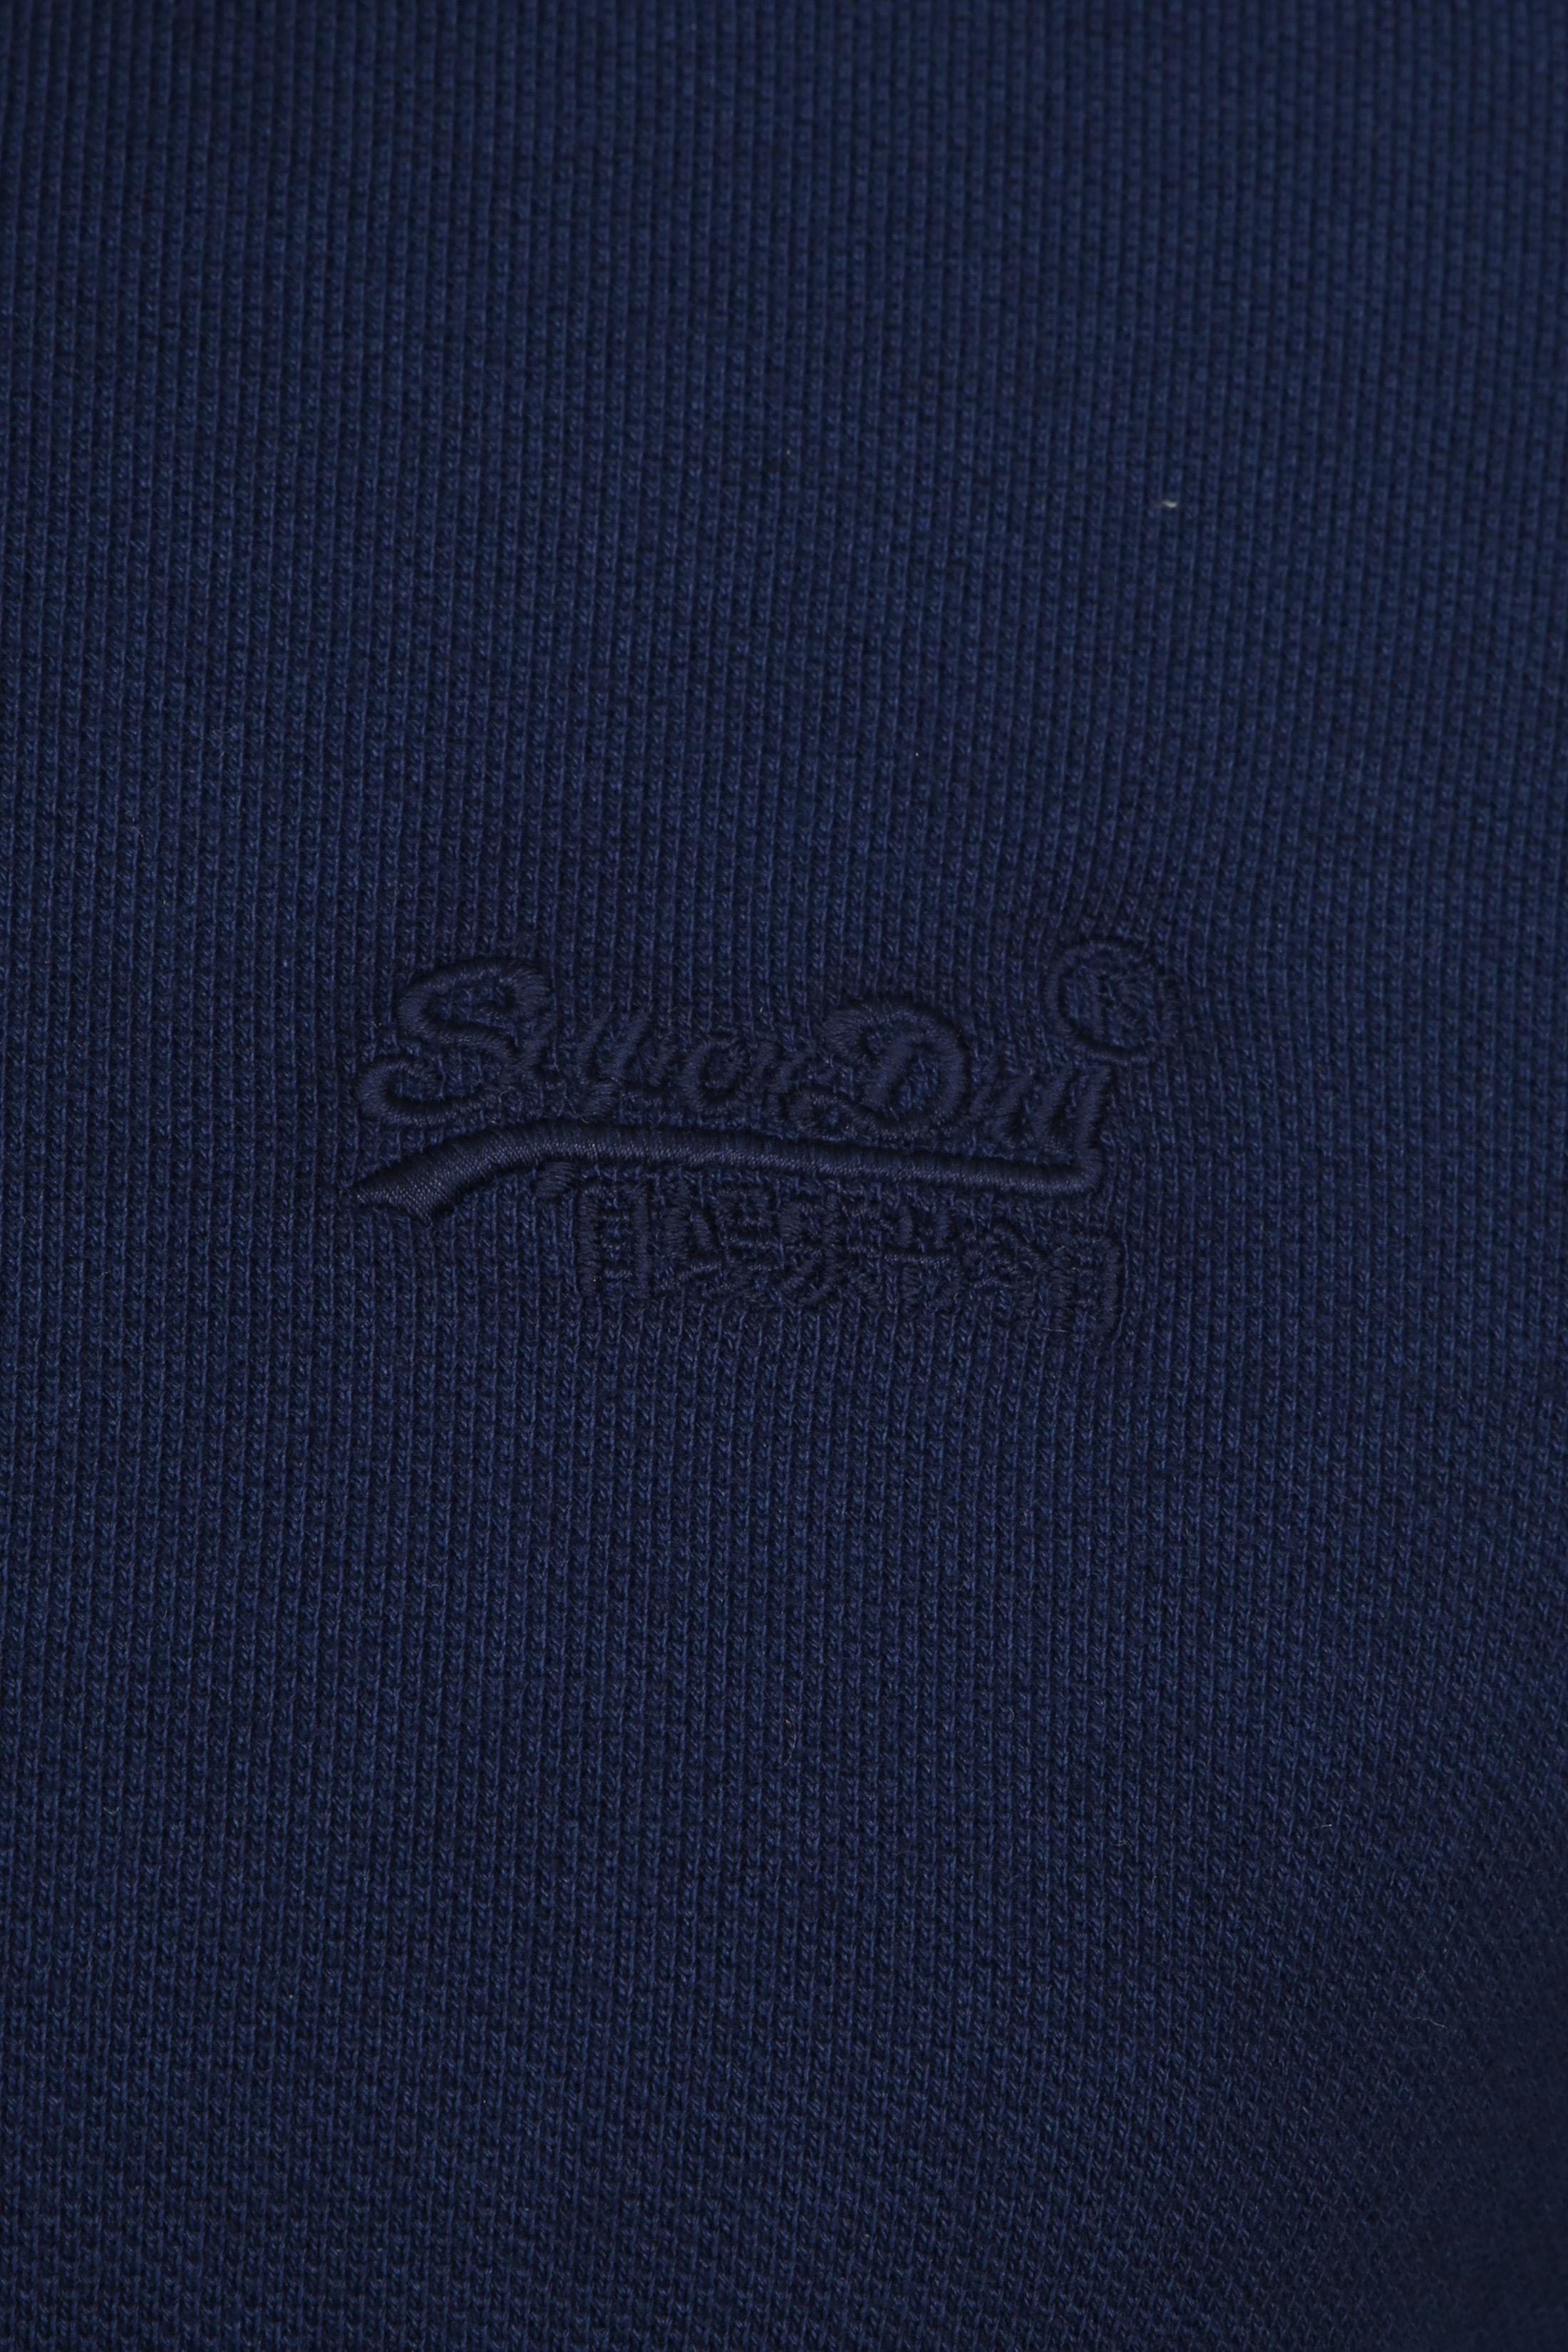 Superdry Premium Poloshirt Dunkelblau foto 1